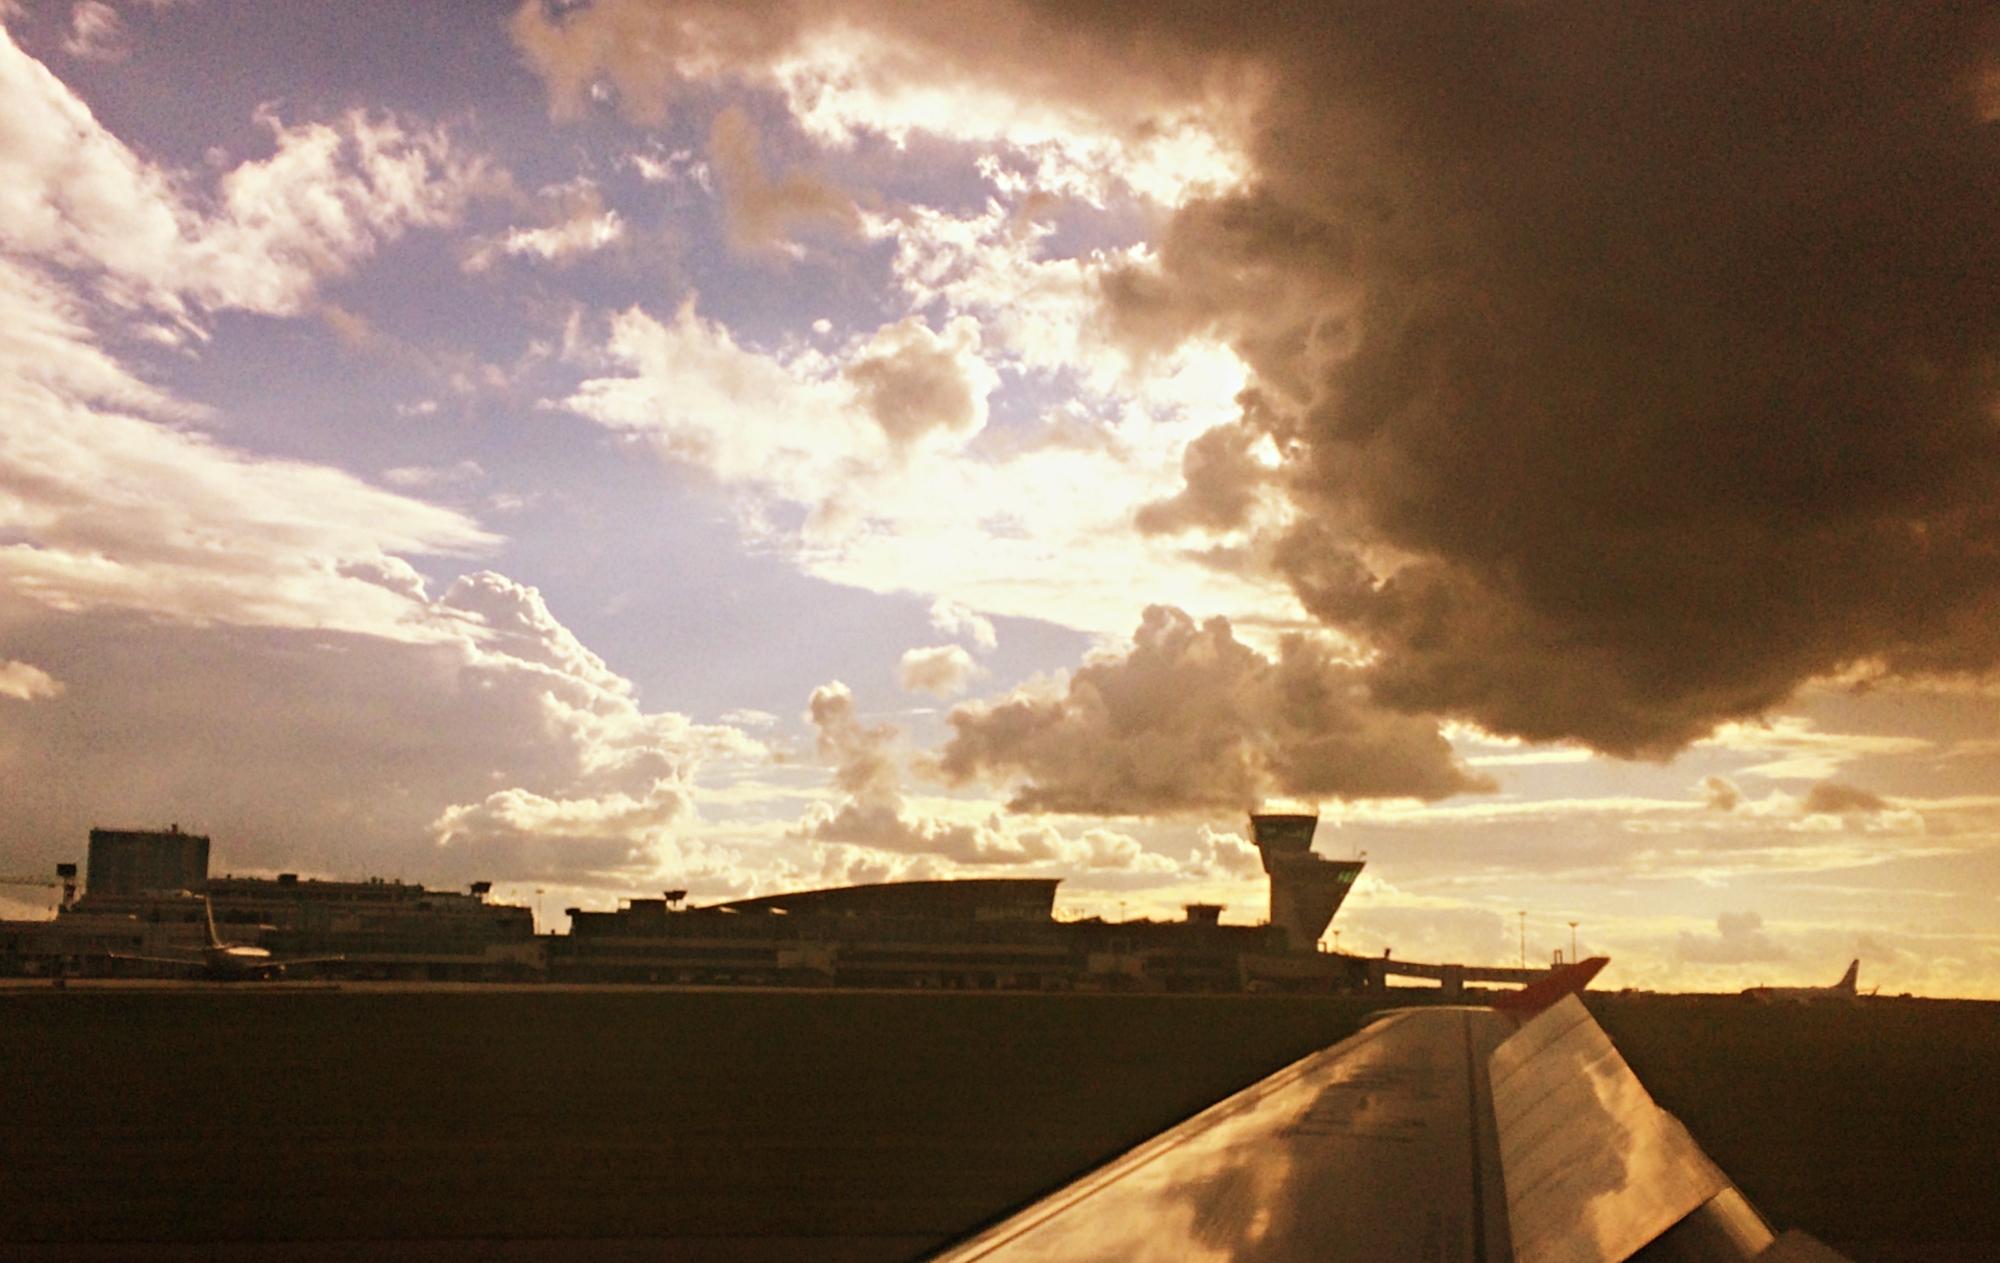 Helsinki Airport